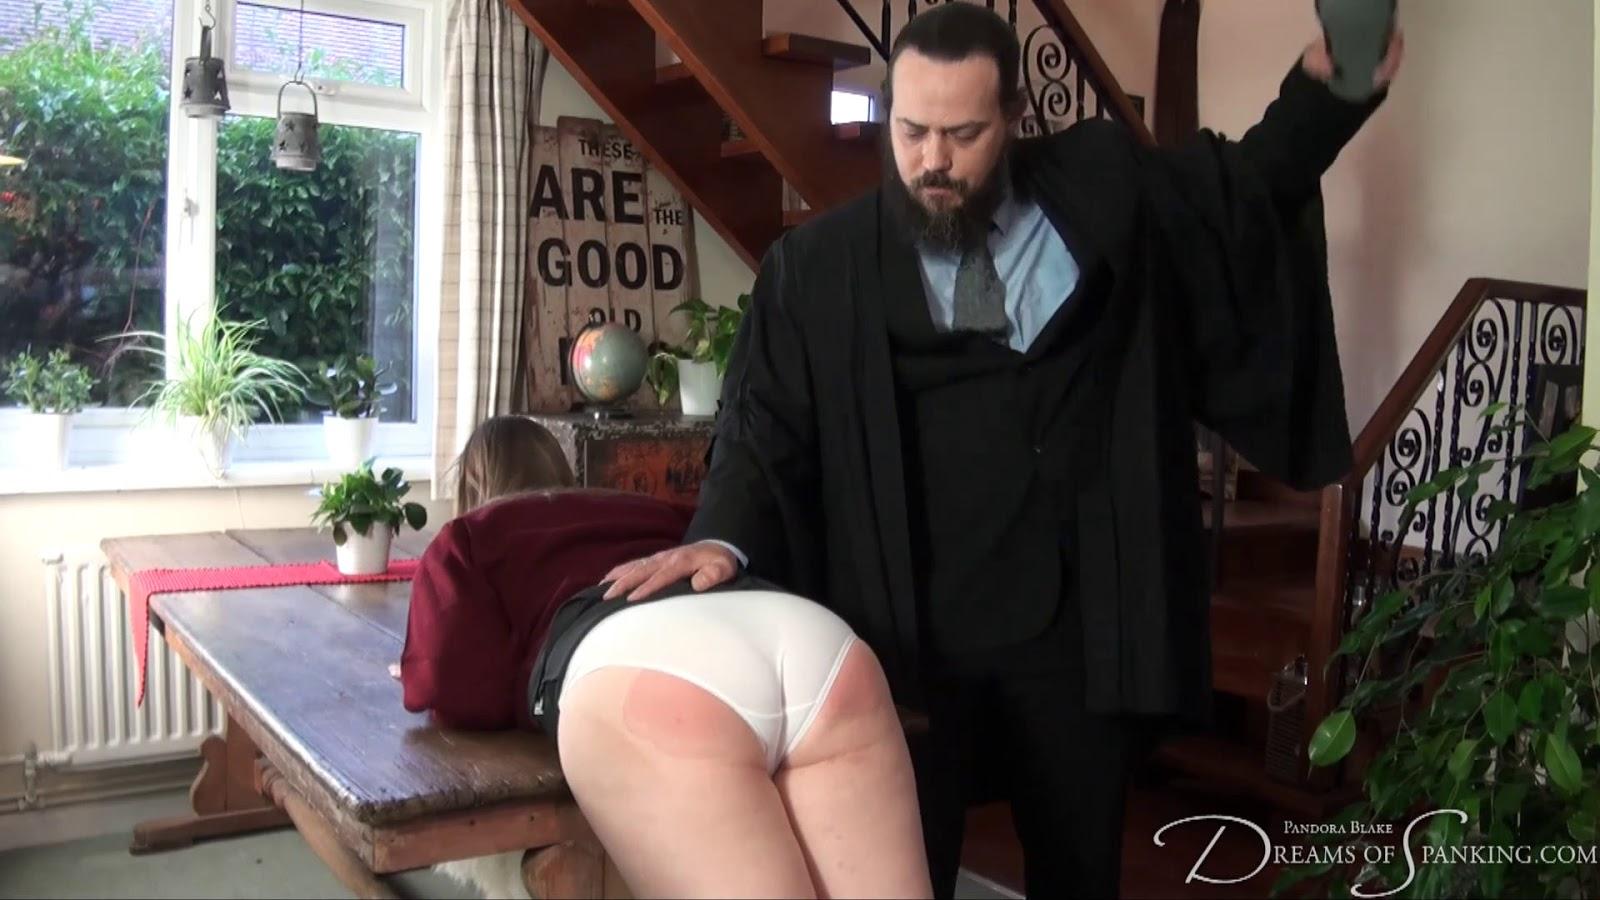 Lil wayne and sex